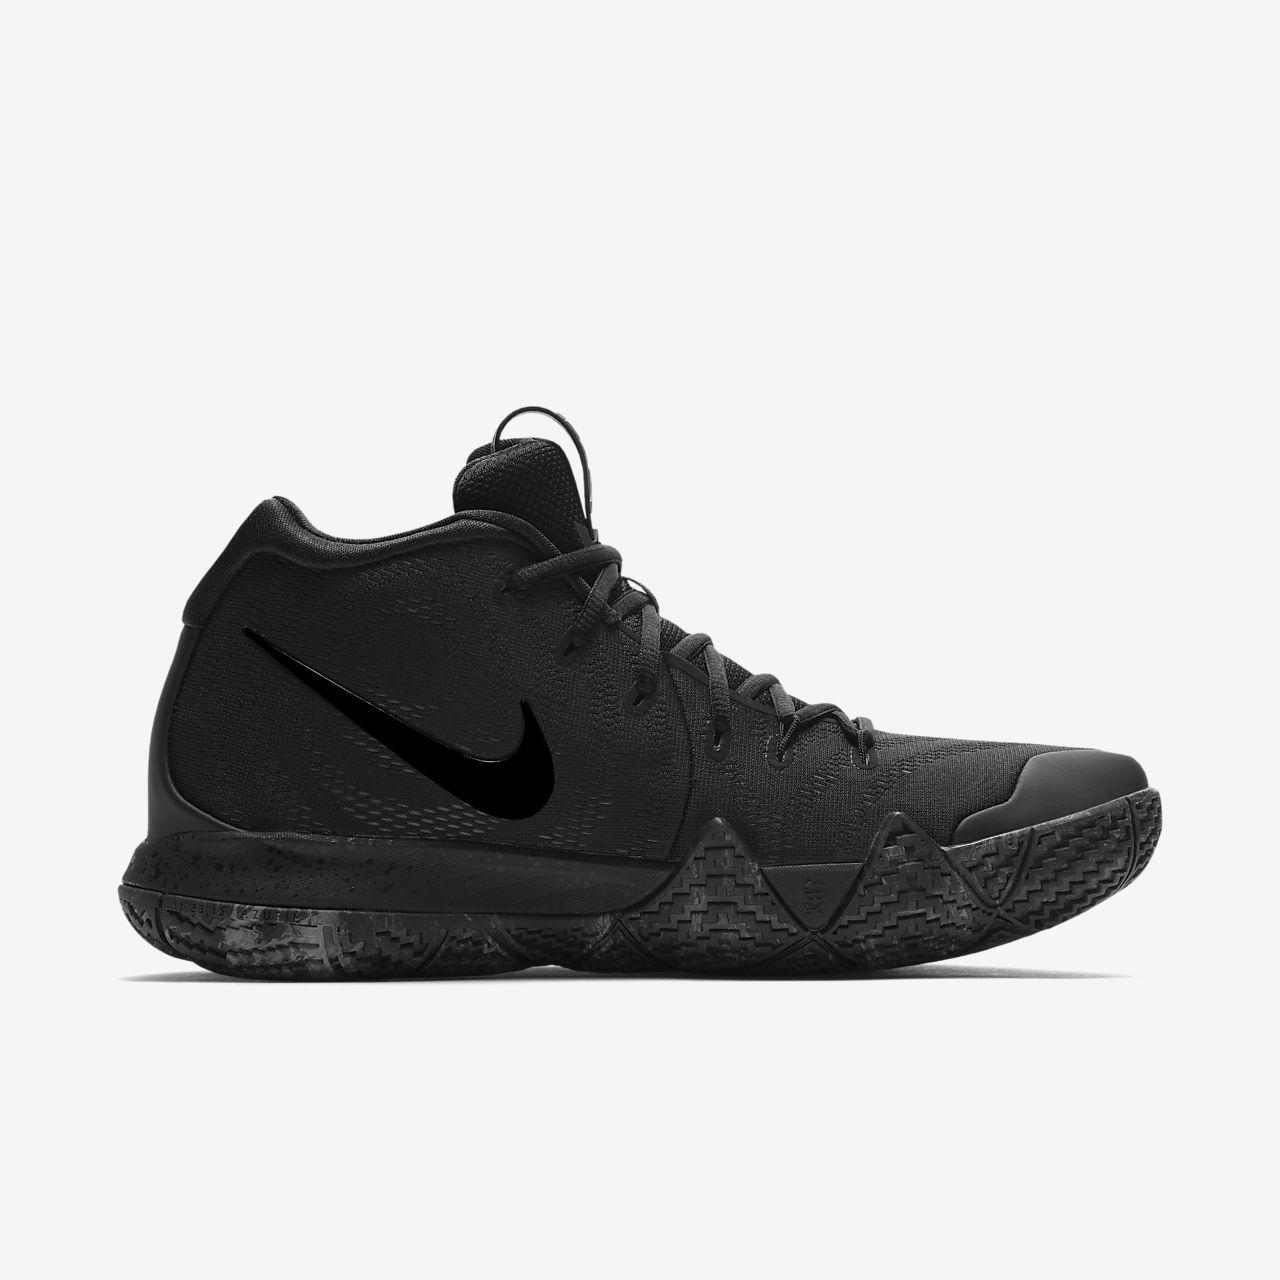 c8d7d573648 Chaussure de basketball Kyrie 4. Nike.com CA